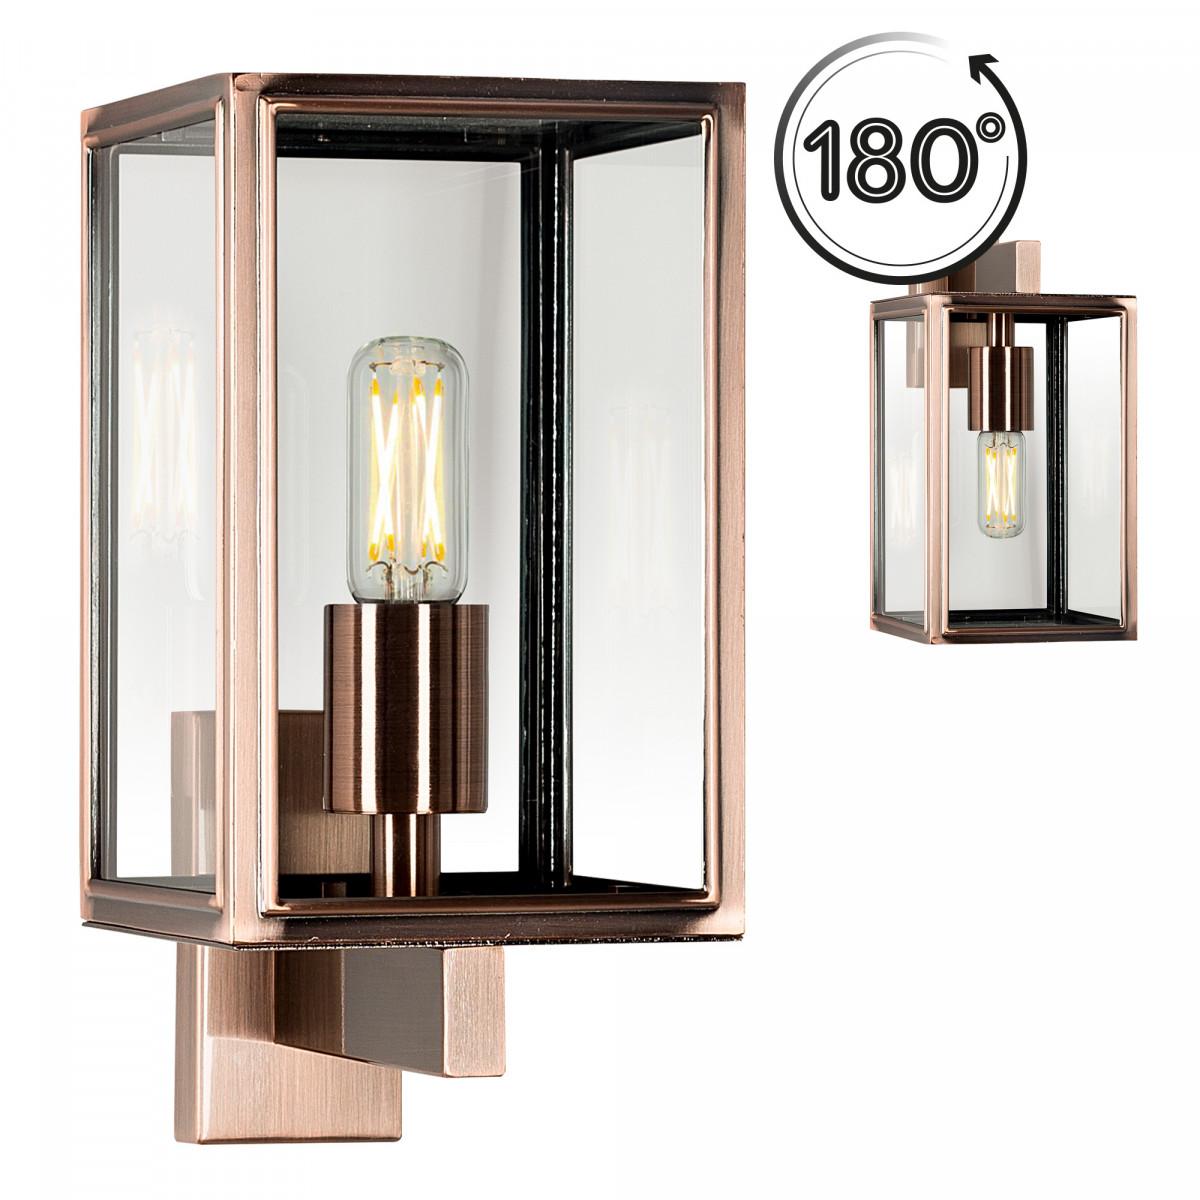 Außenlampe Soho - Edelstahl Schwarz - 7530 - Wandlampe - Wandleuchte - Nostalux